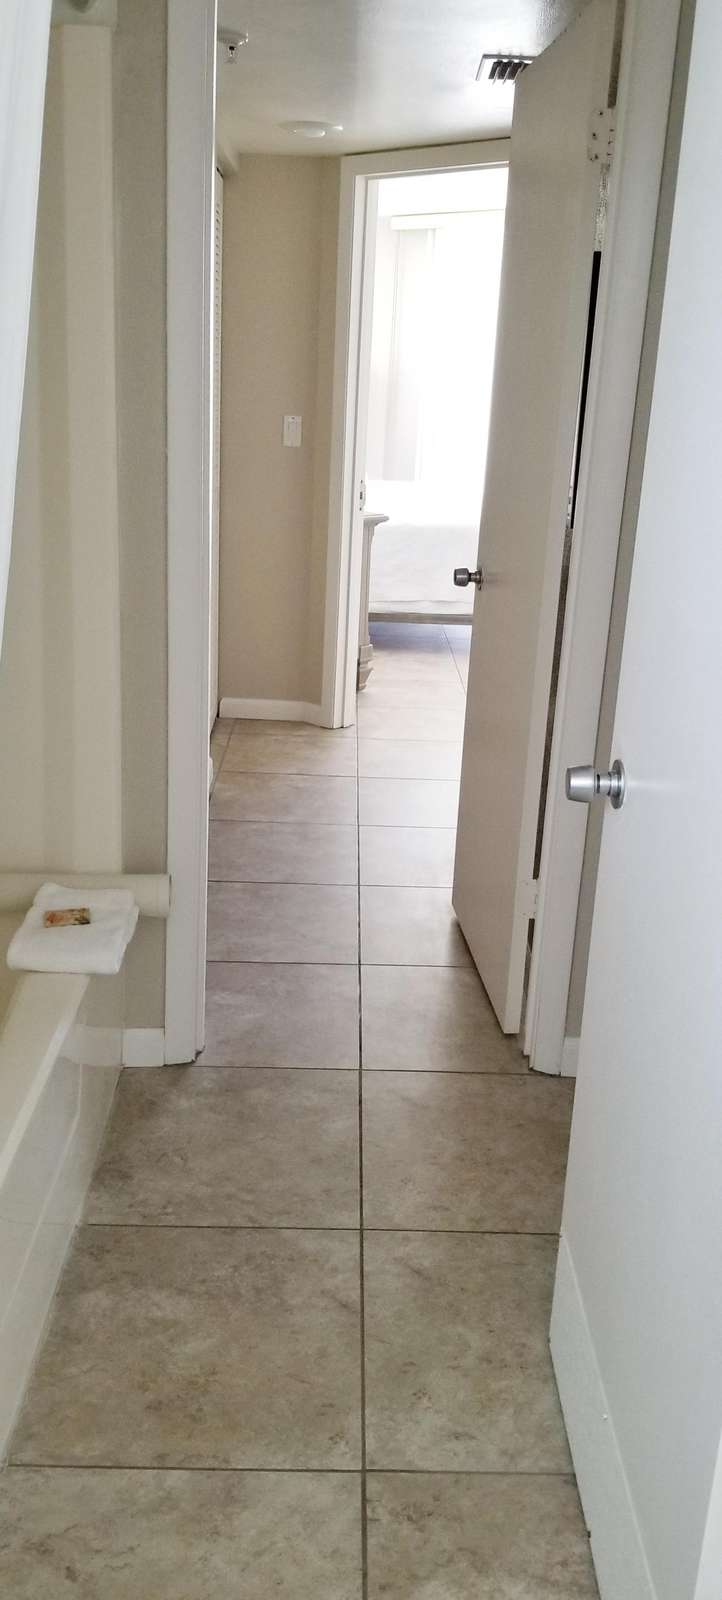 Hall thru bathrooms